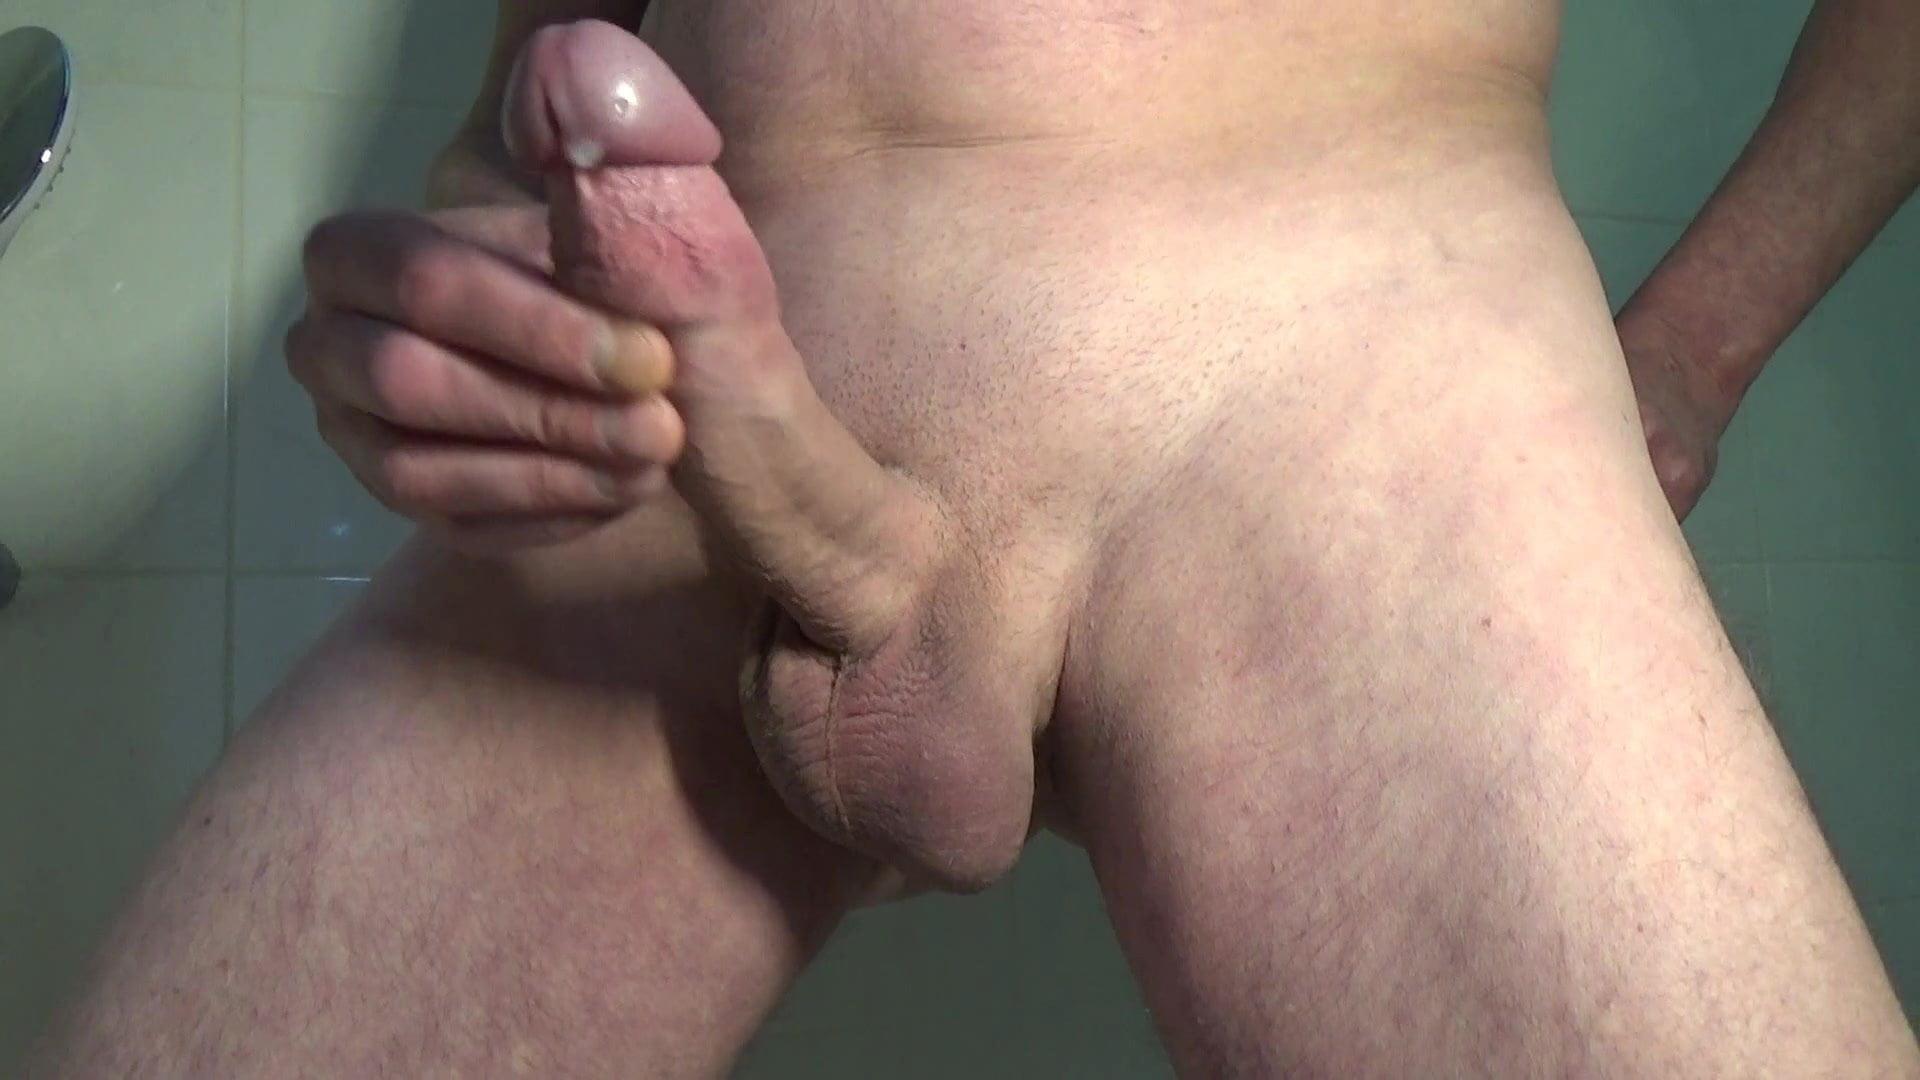 Wichsen den penis Neger wichst